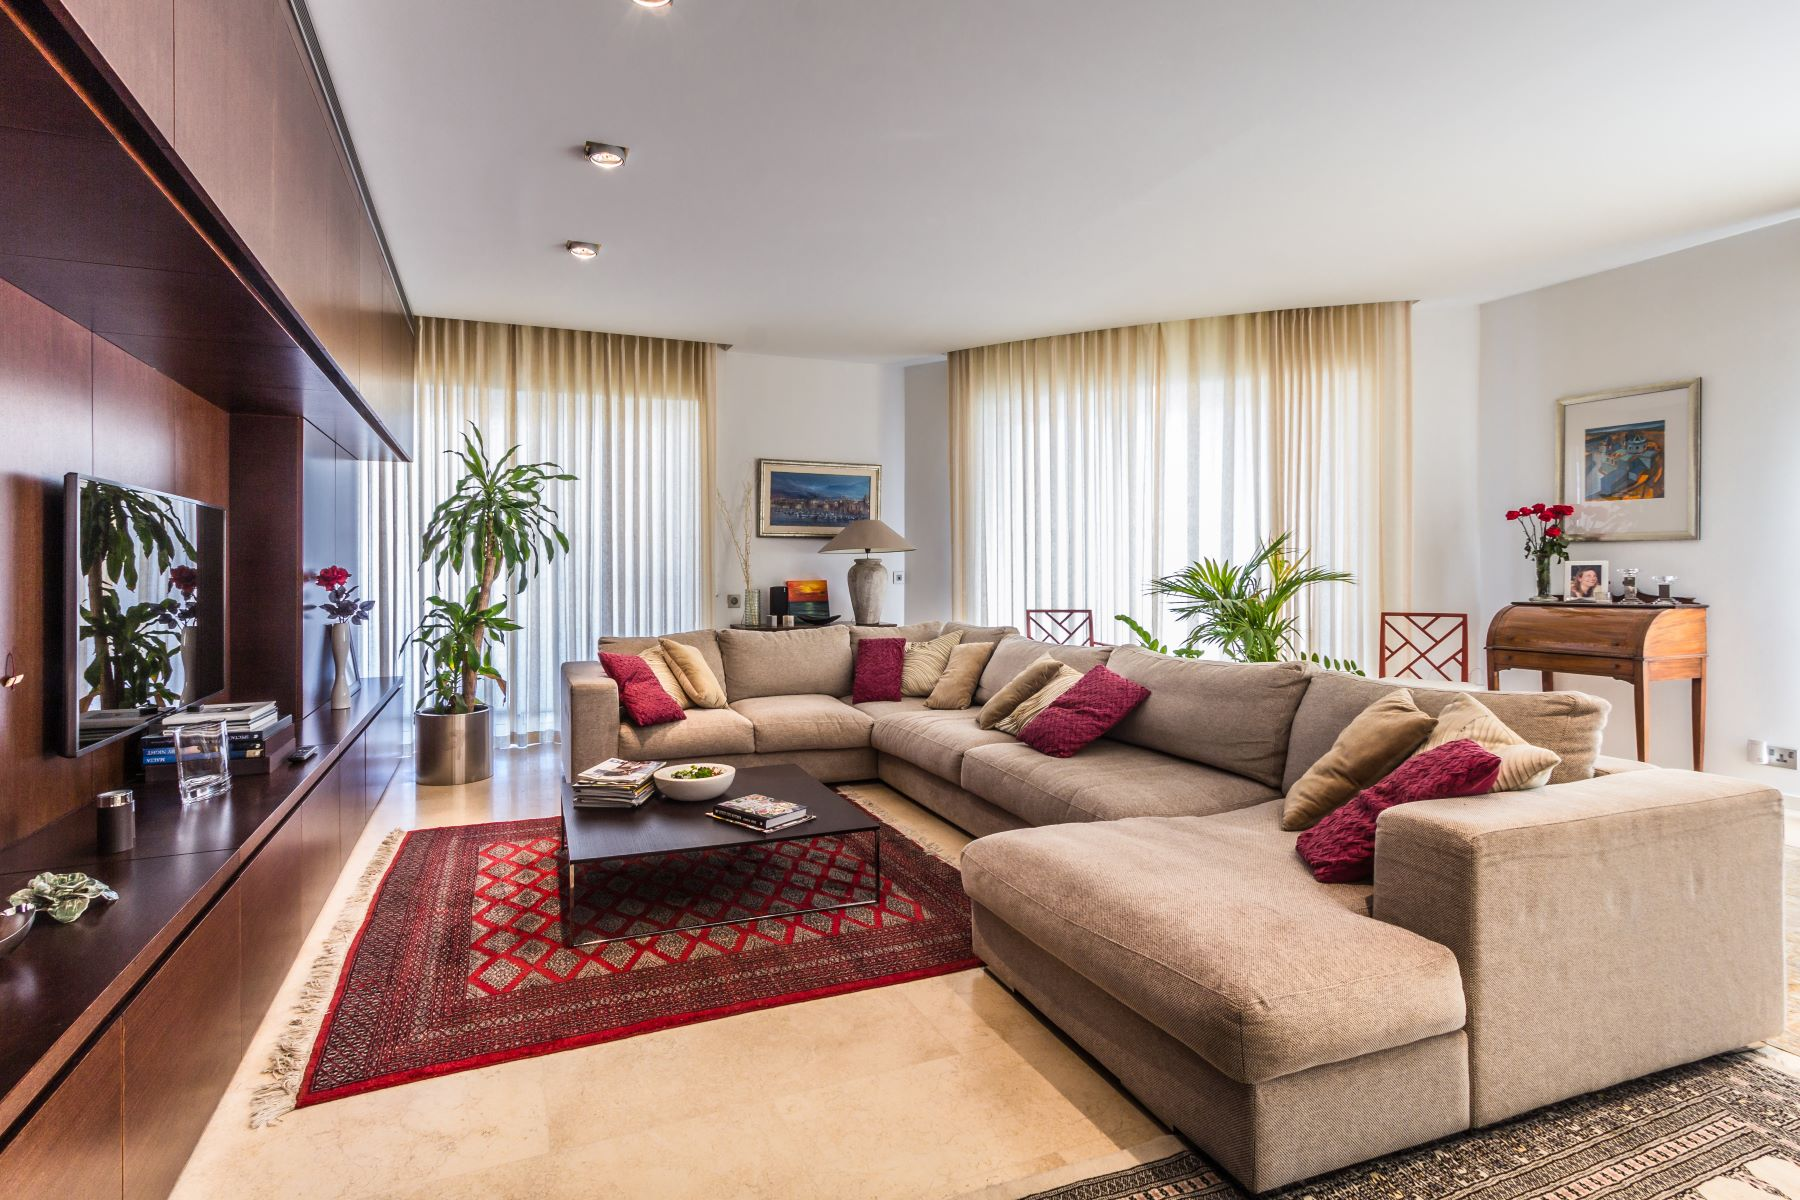 شقة للـ Sale في Luxury Apartment Swieqi, Malta